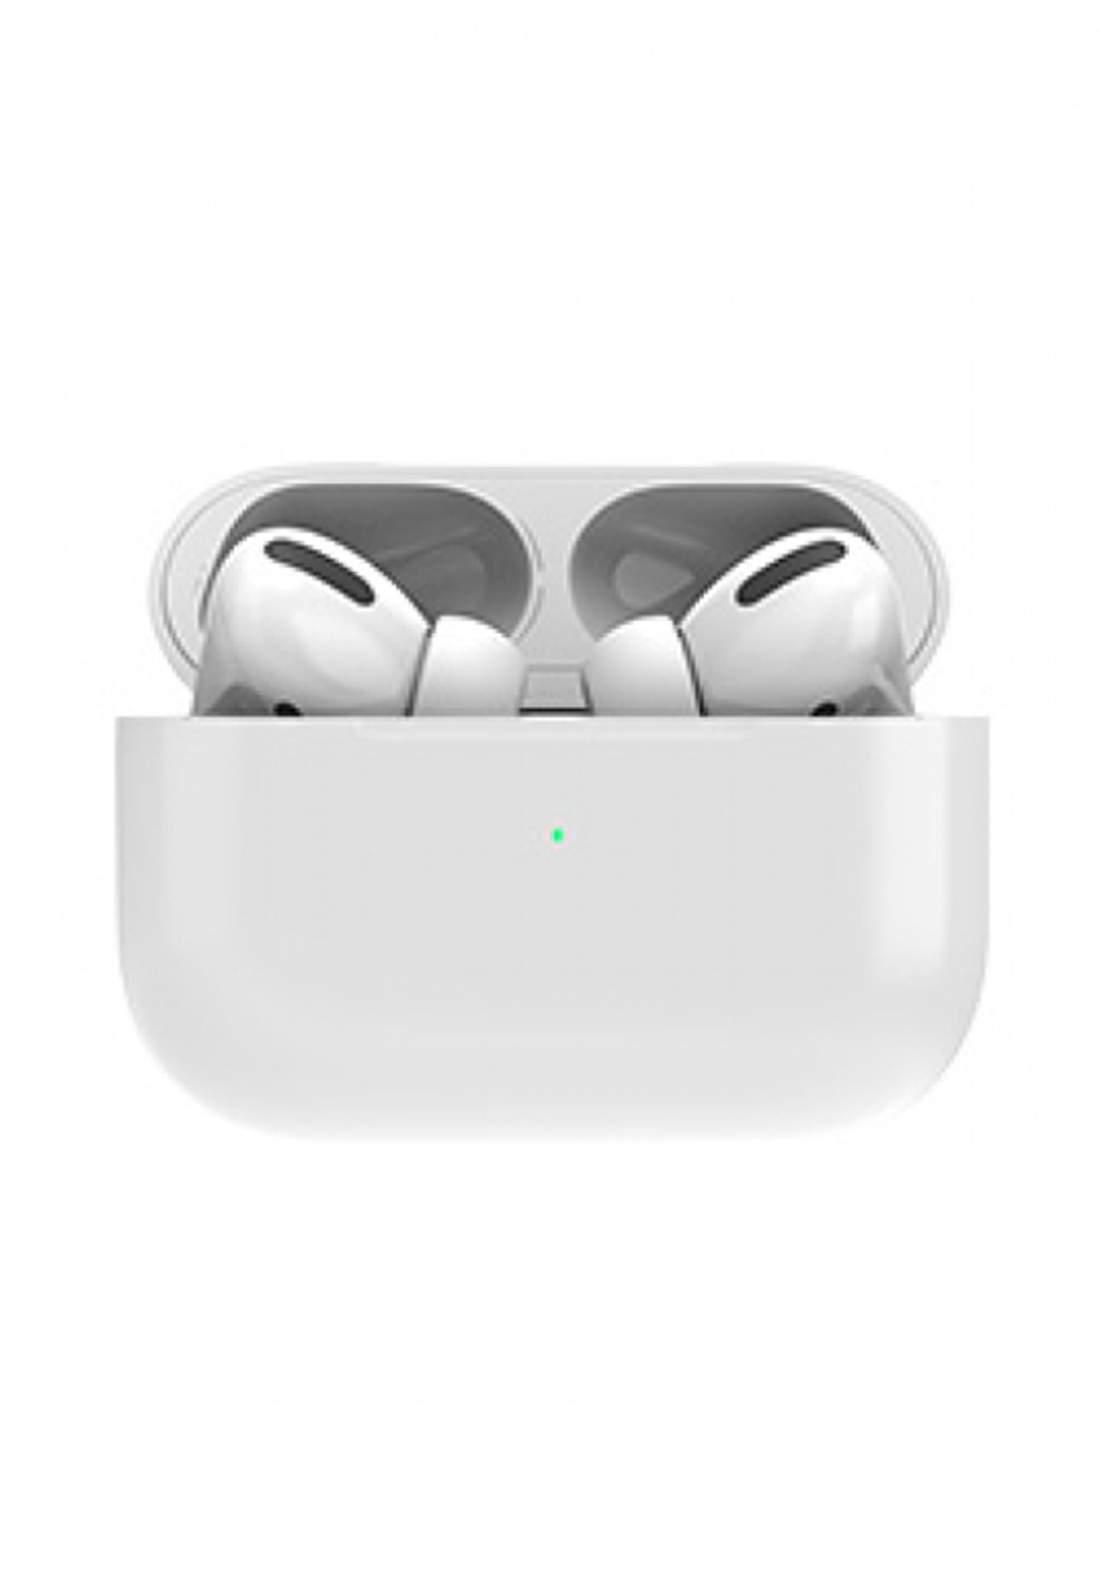 Porodo Soundtec Pure Sound Wireless Earbuds Pro- White